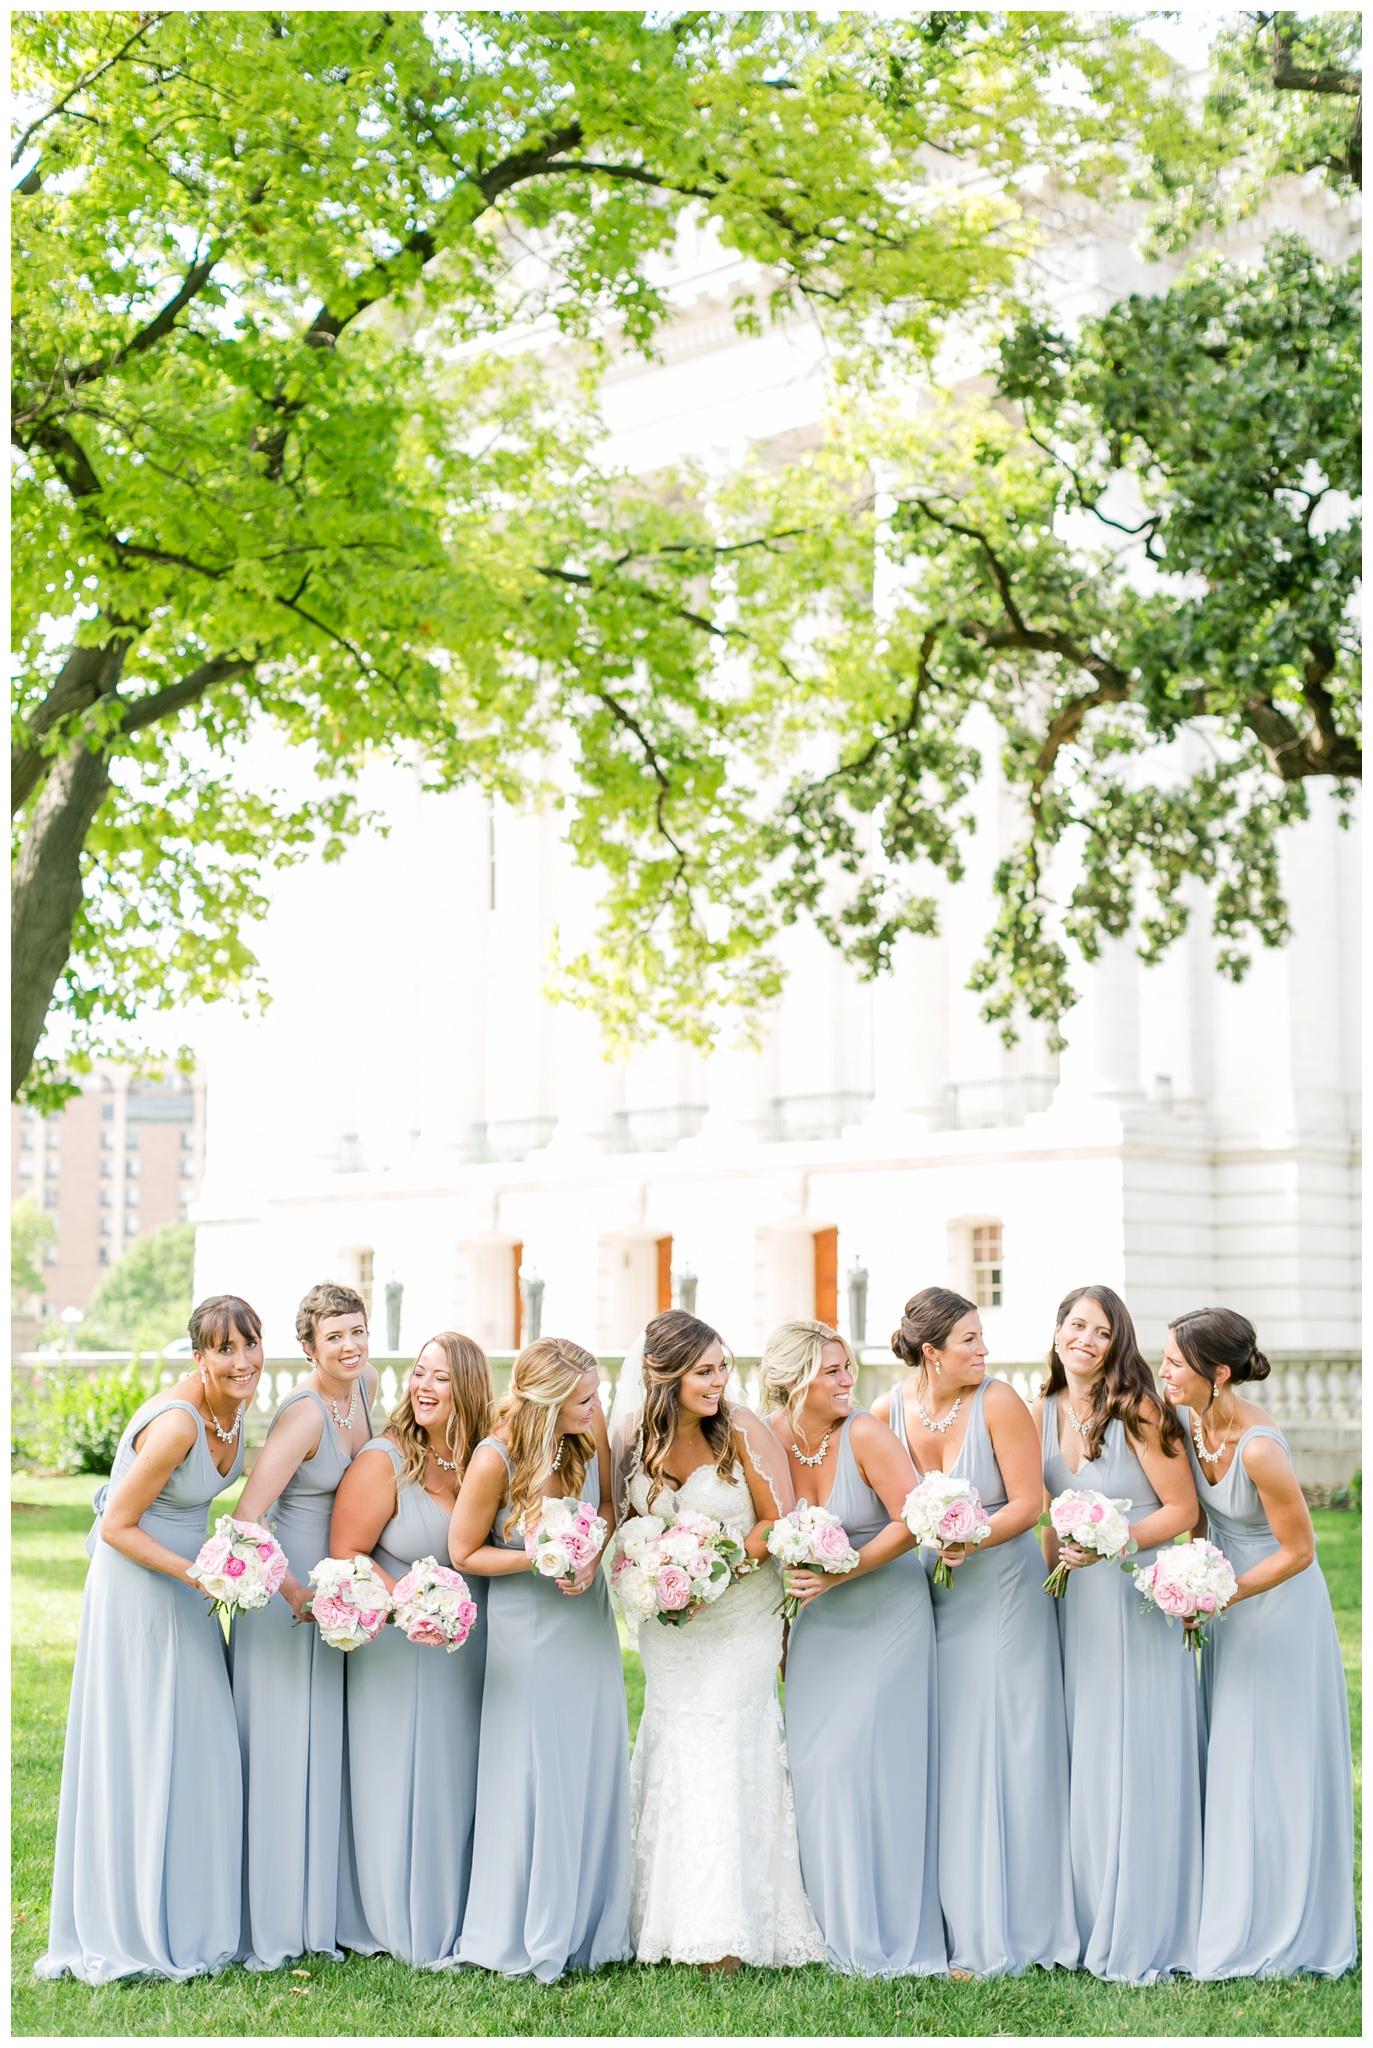 UW_Memorial_Union_wedding_madison_wisconsin_wedding_photographers_4615.jpg